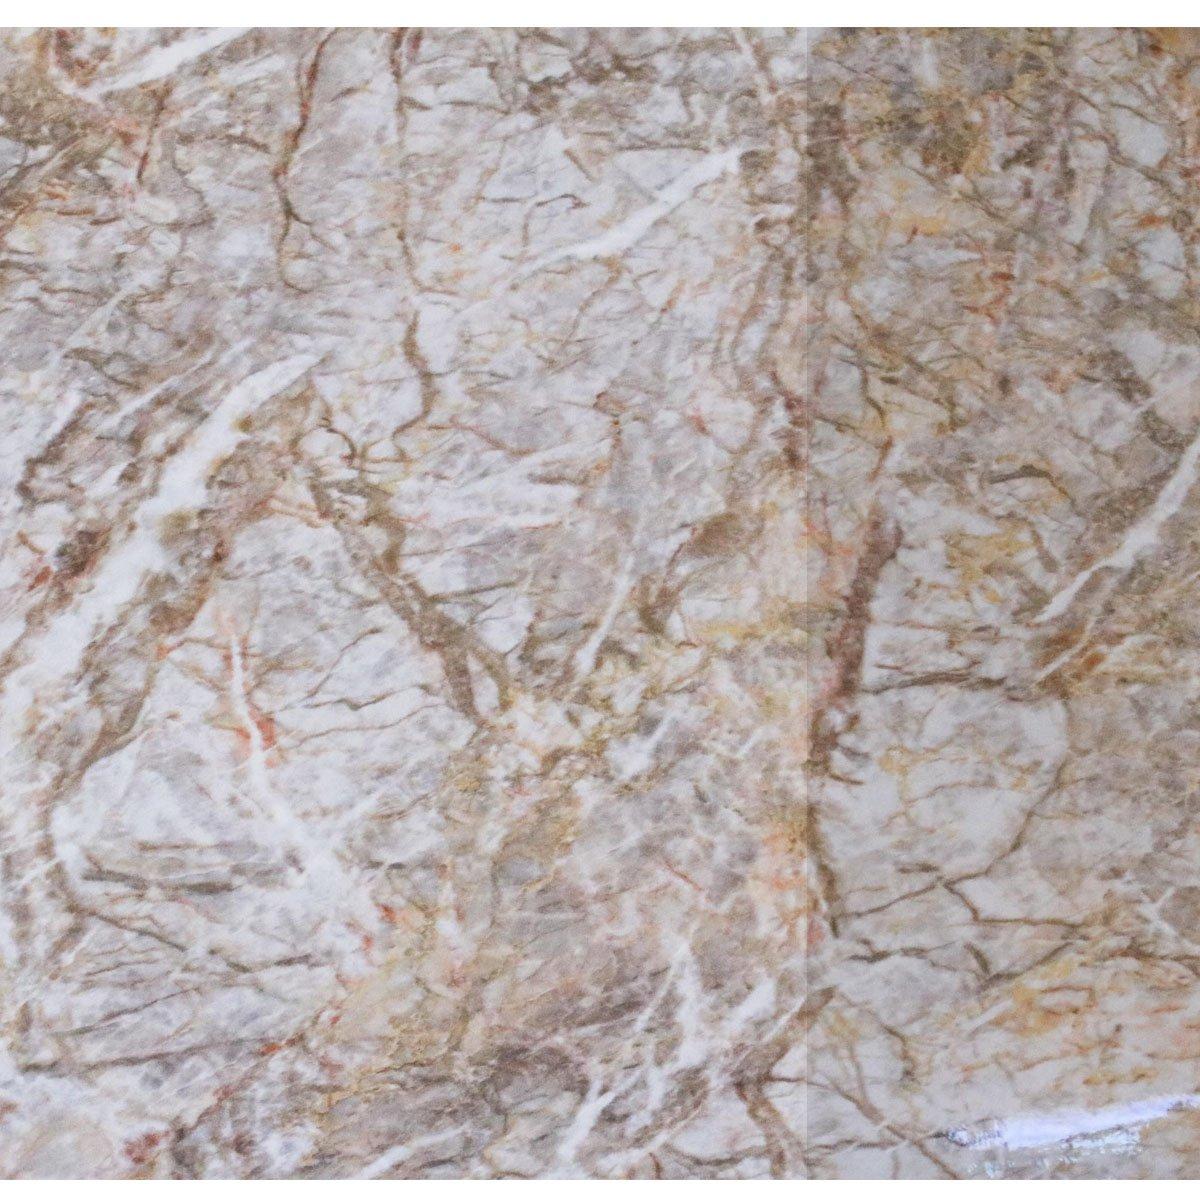 Great Wallpaper Marble Paper - 81Xcg%2BQ7-7L  Pictures_477534.jpg